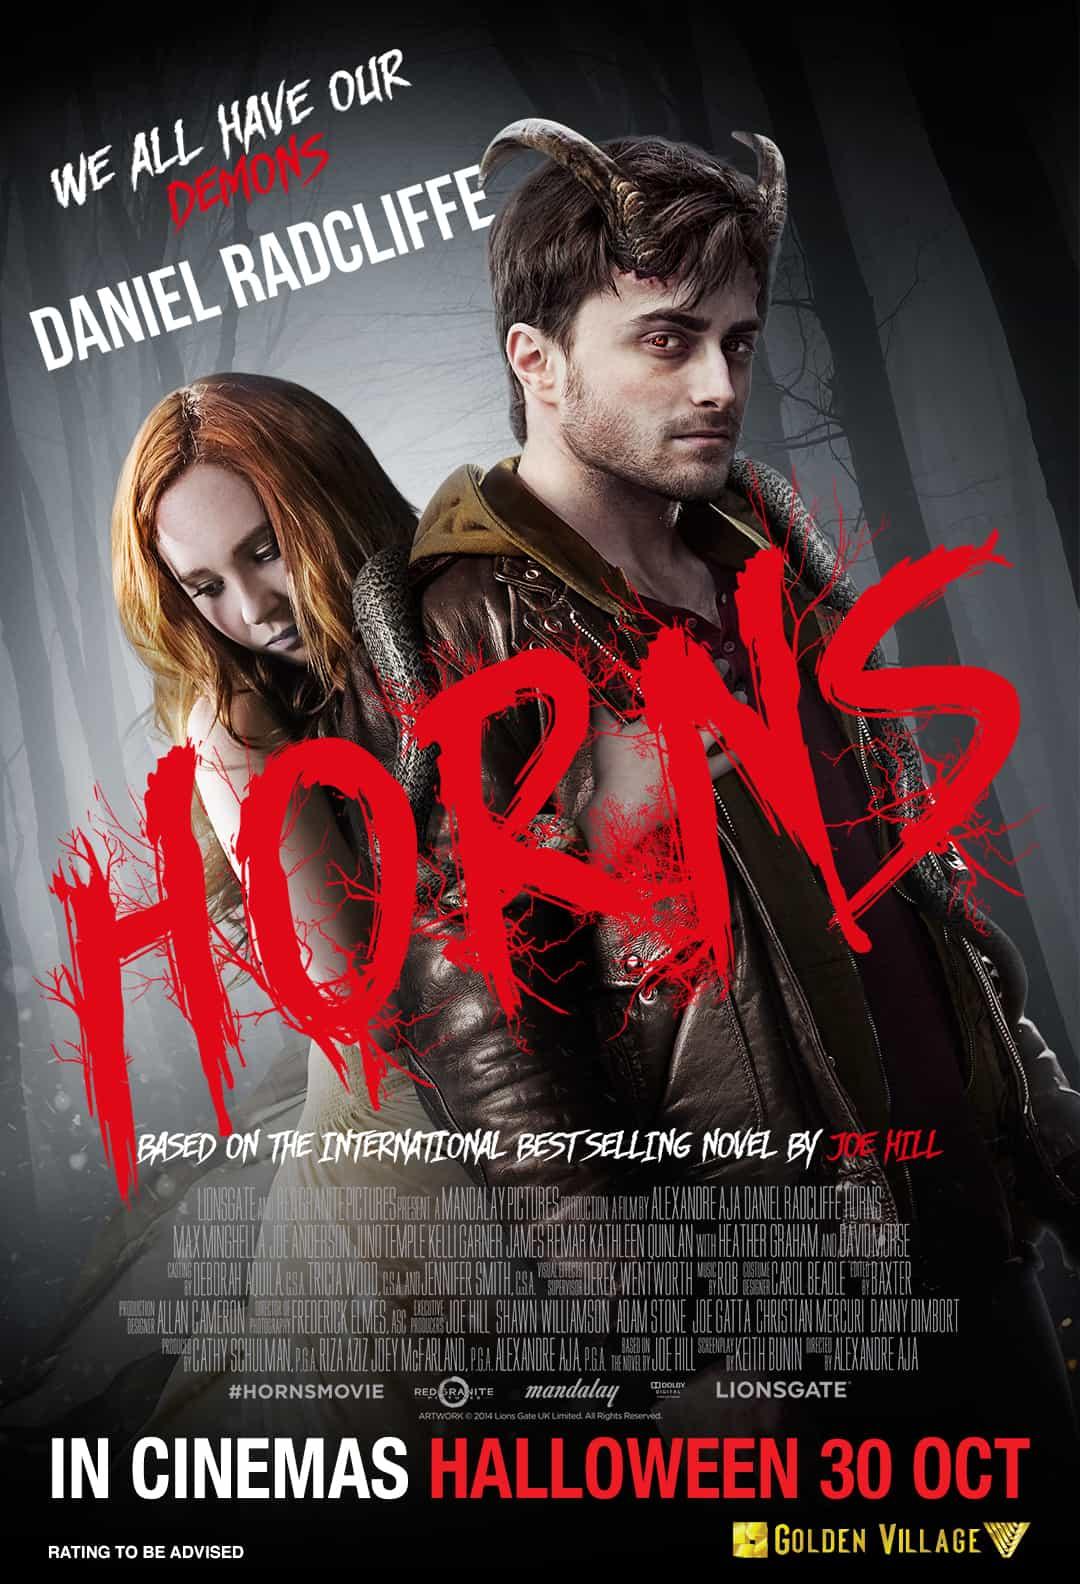 HORNS – Contest